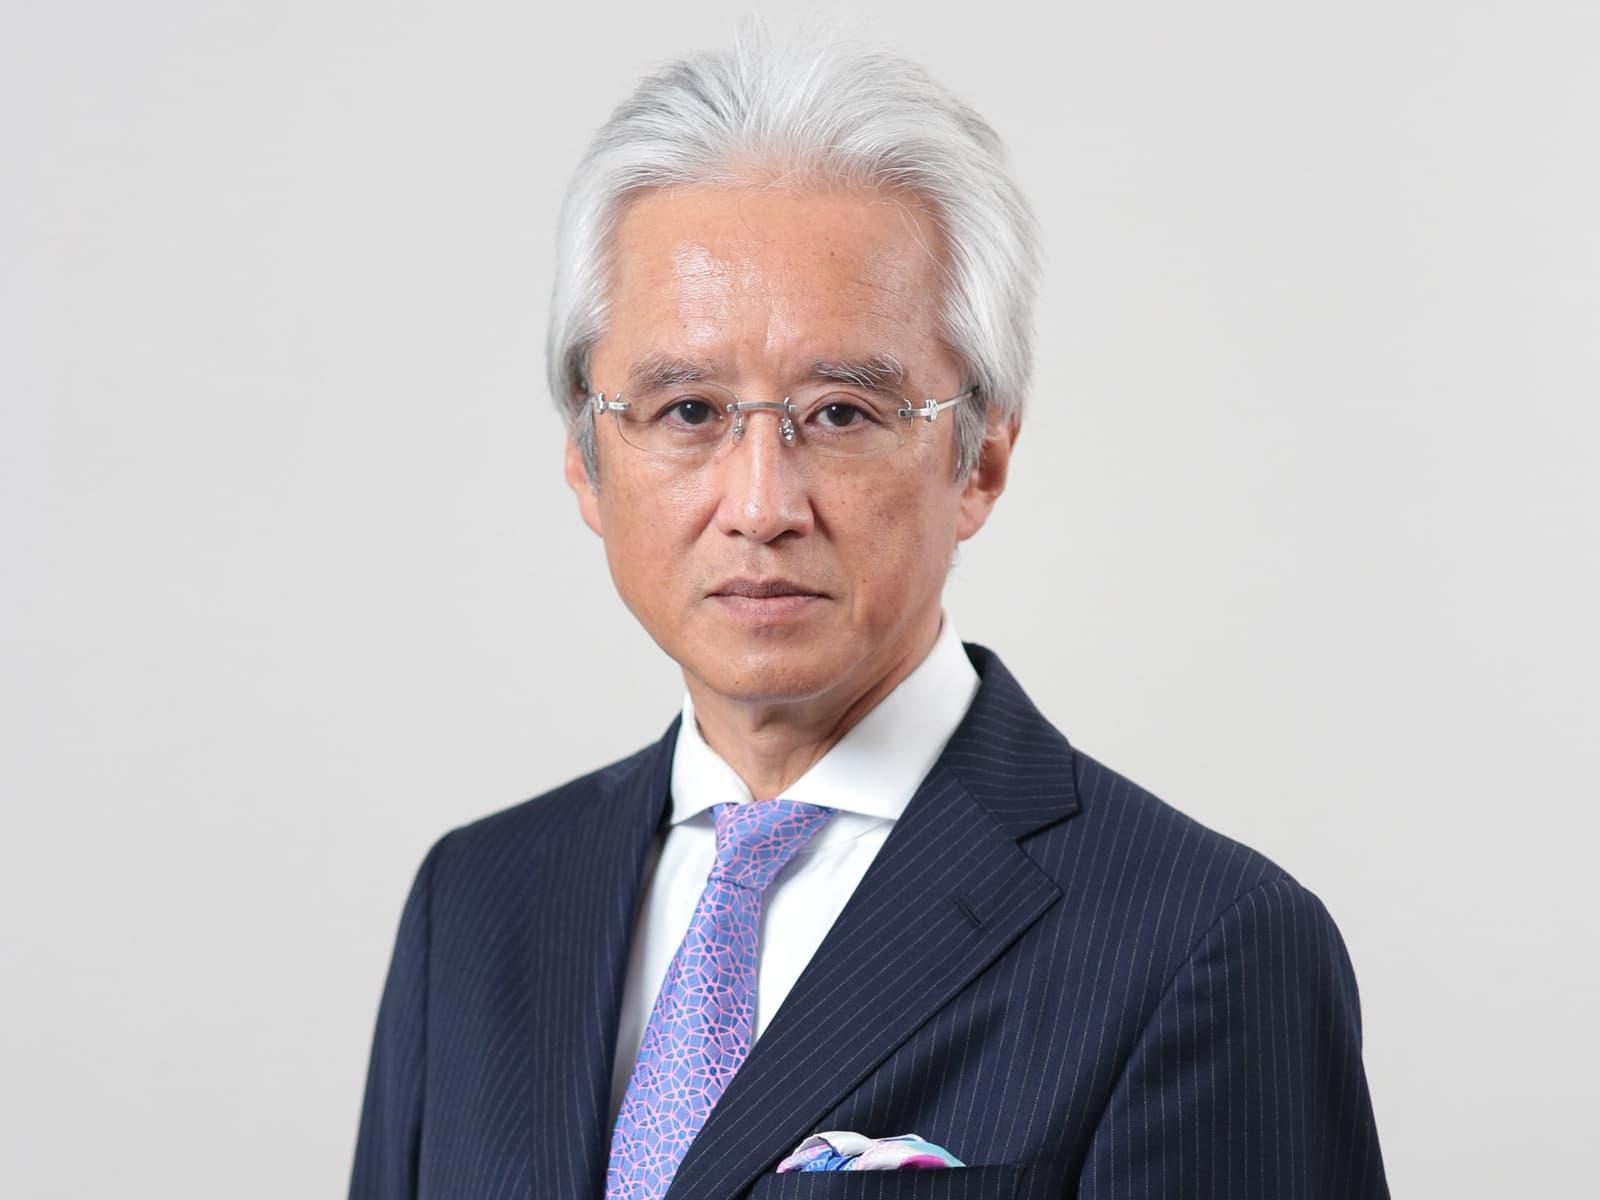 https://course-kagawa.com/wp-content/uploads/2020/03/johoku_shachou-1.jpg